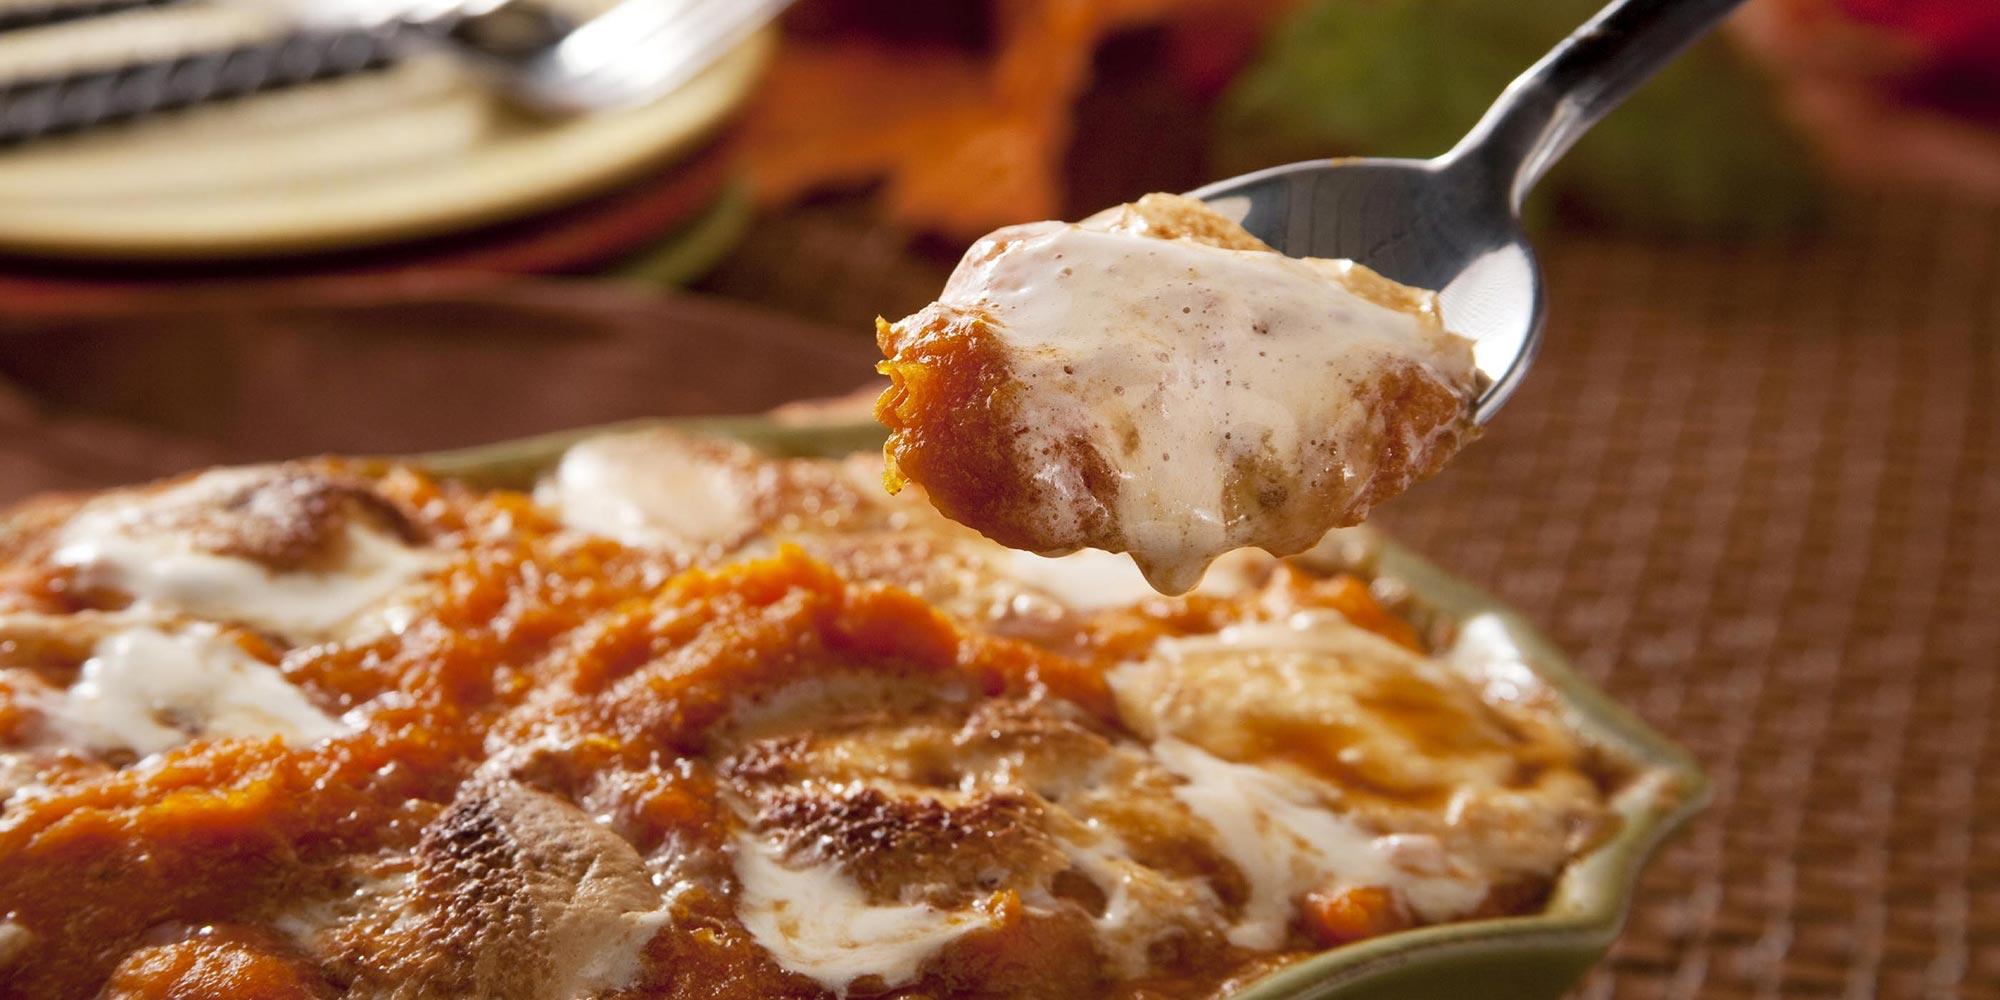 Cazuela de patata dulce confitada